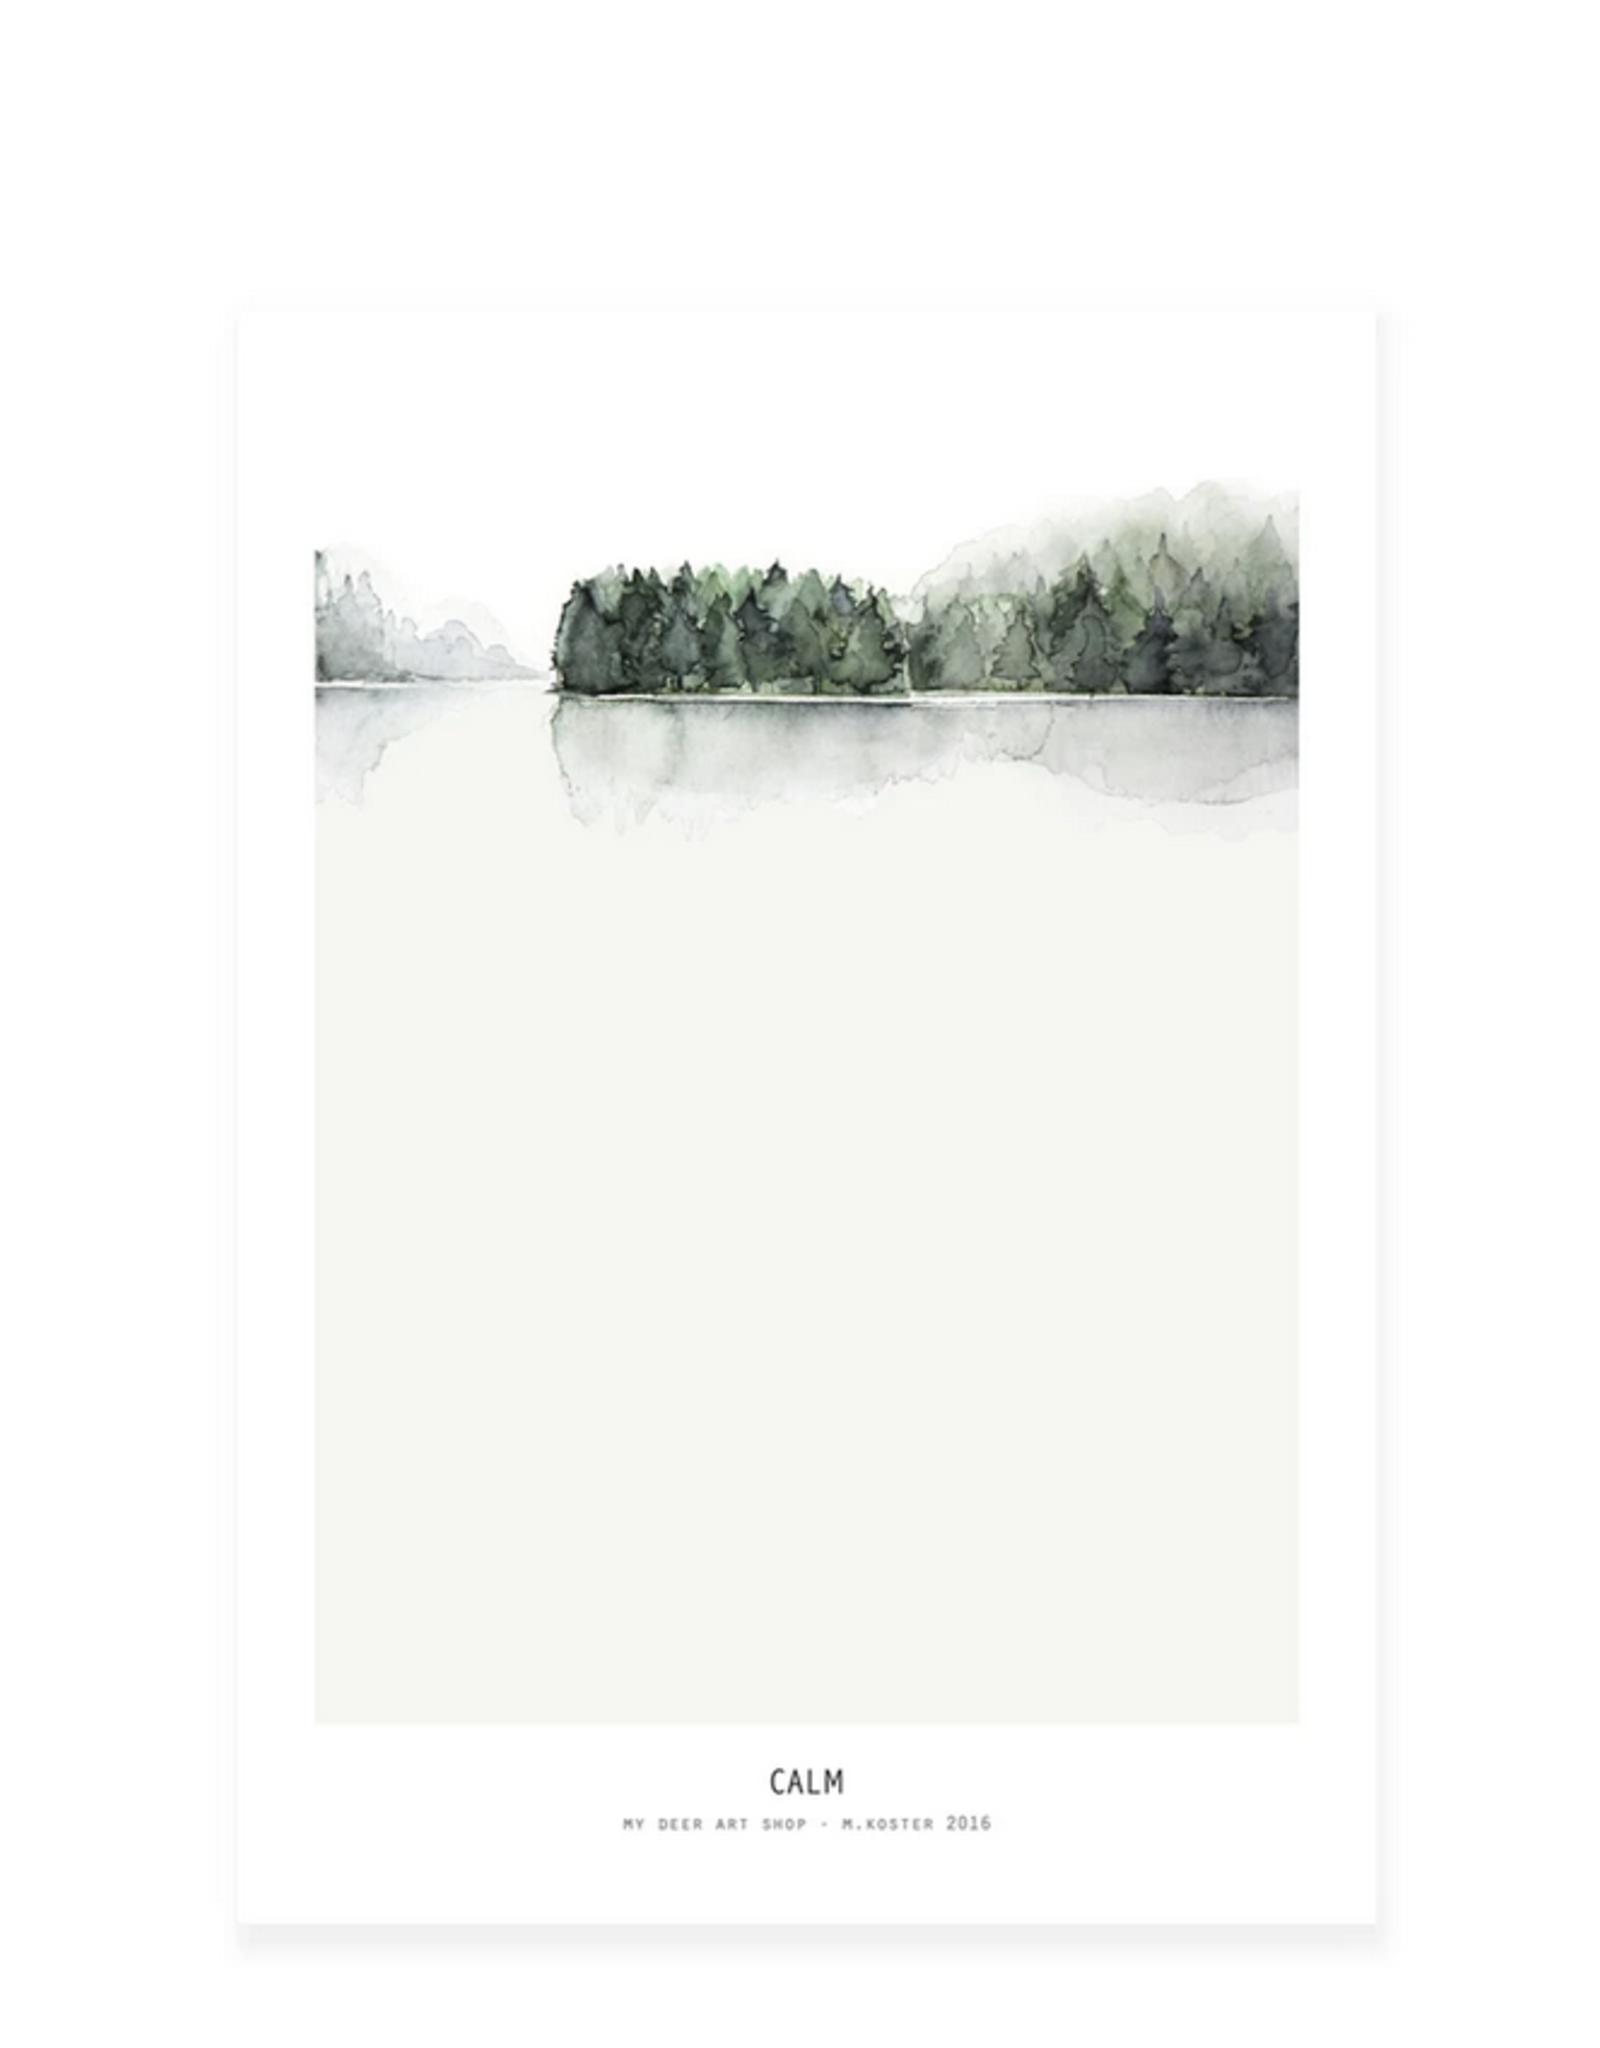 My deer art shop My deer art - mini prints - Calm - A5